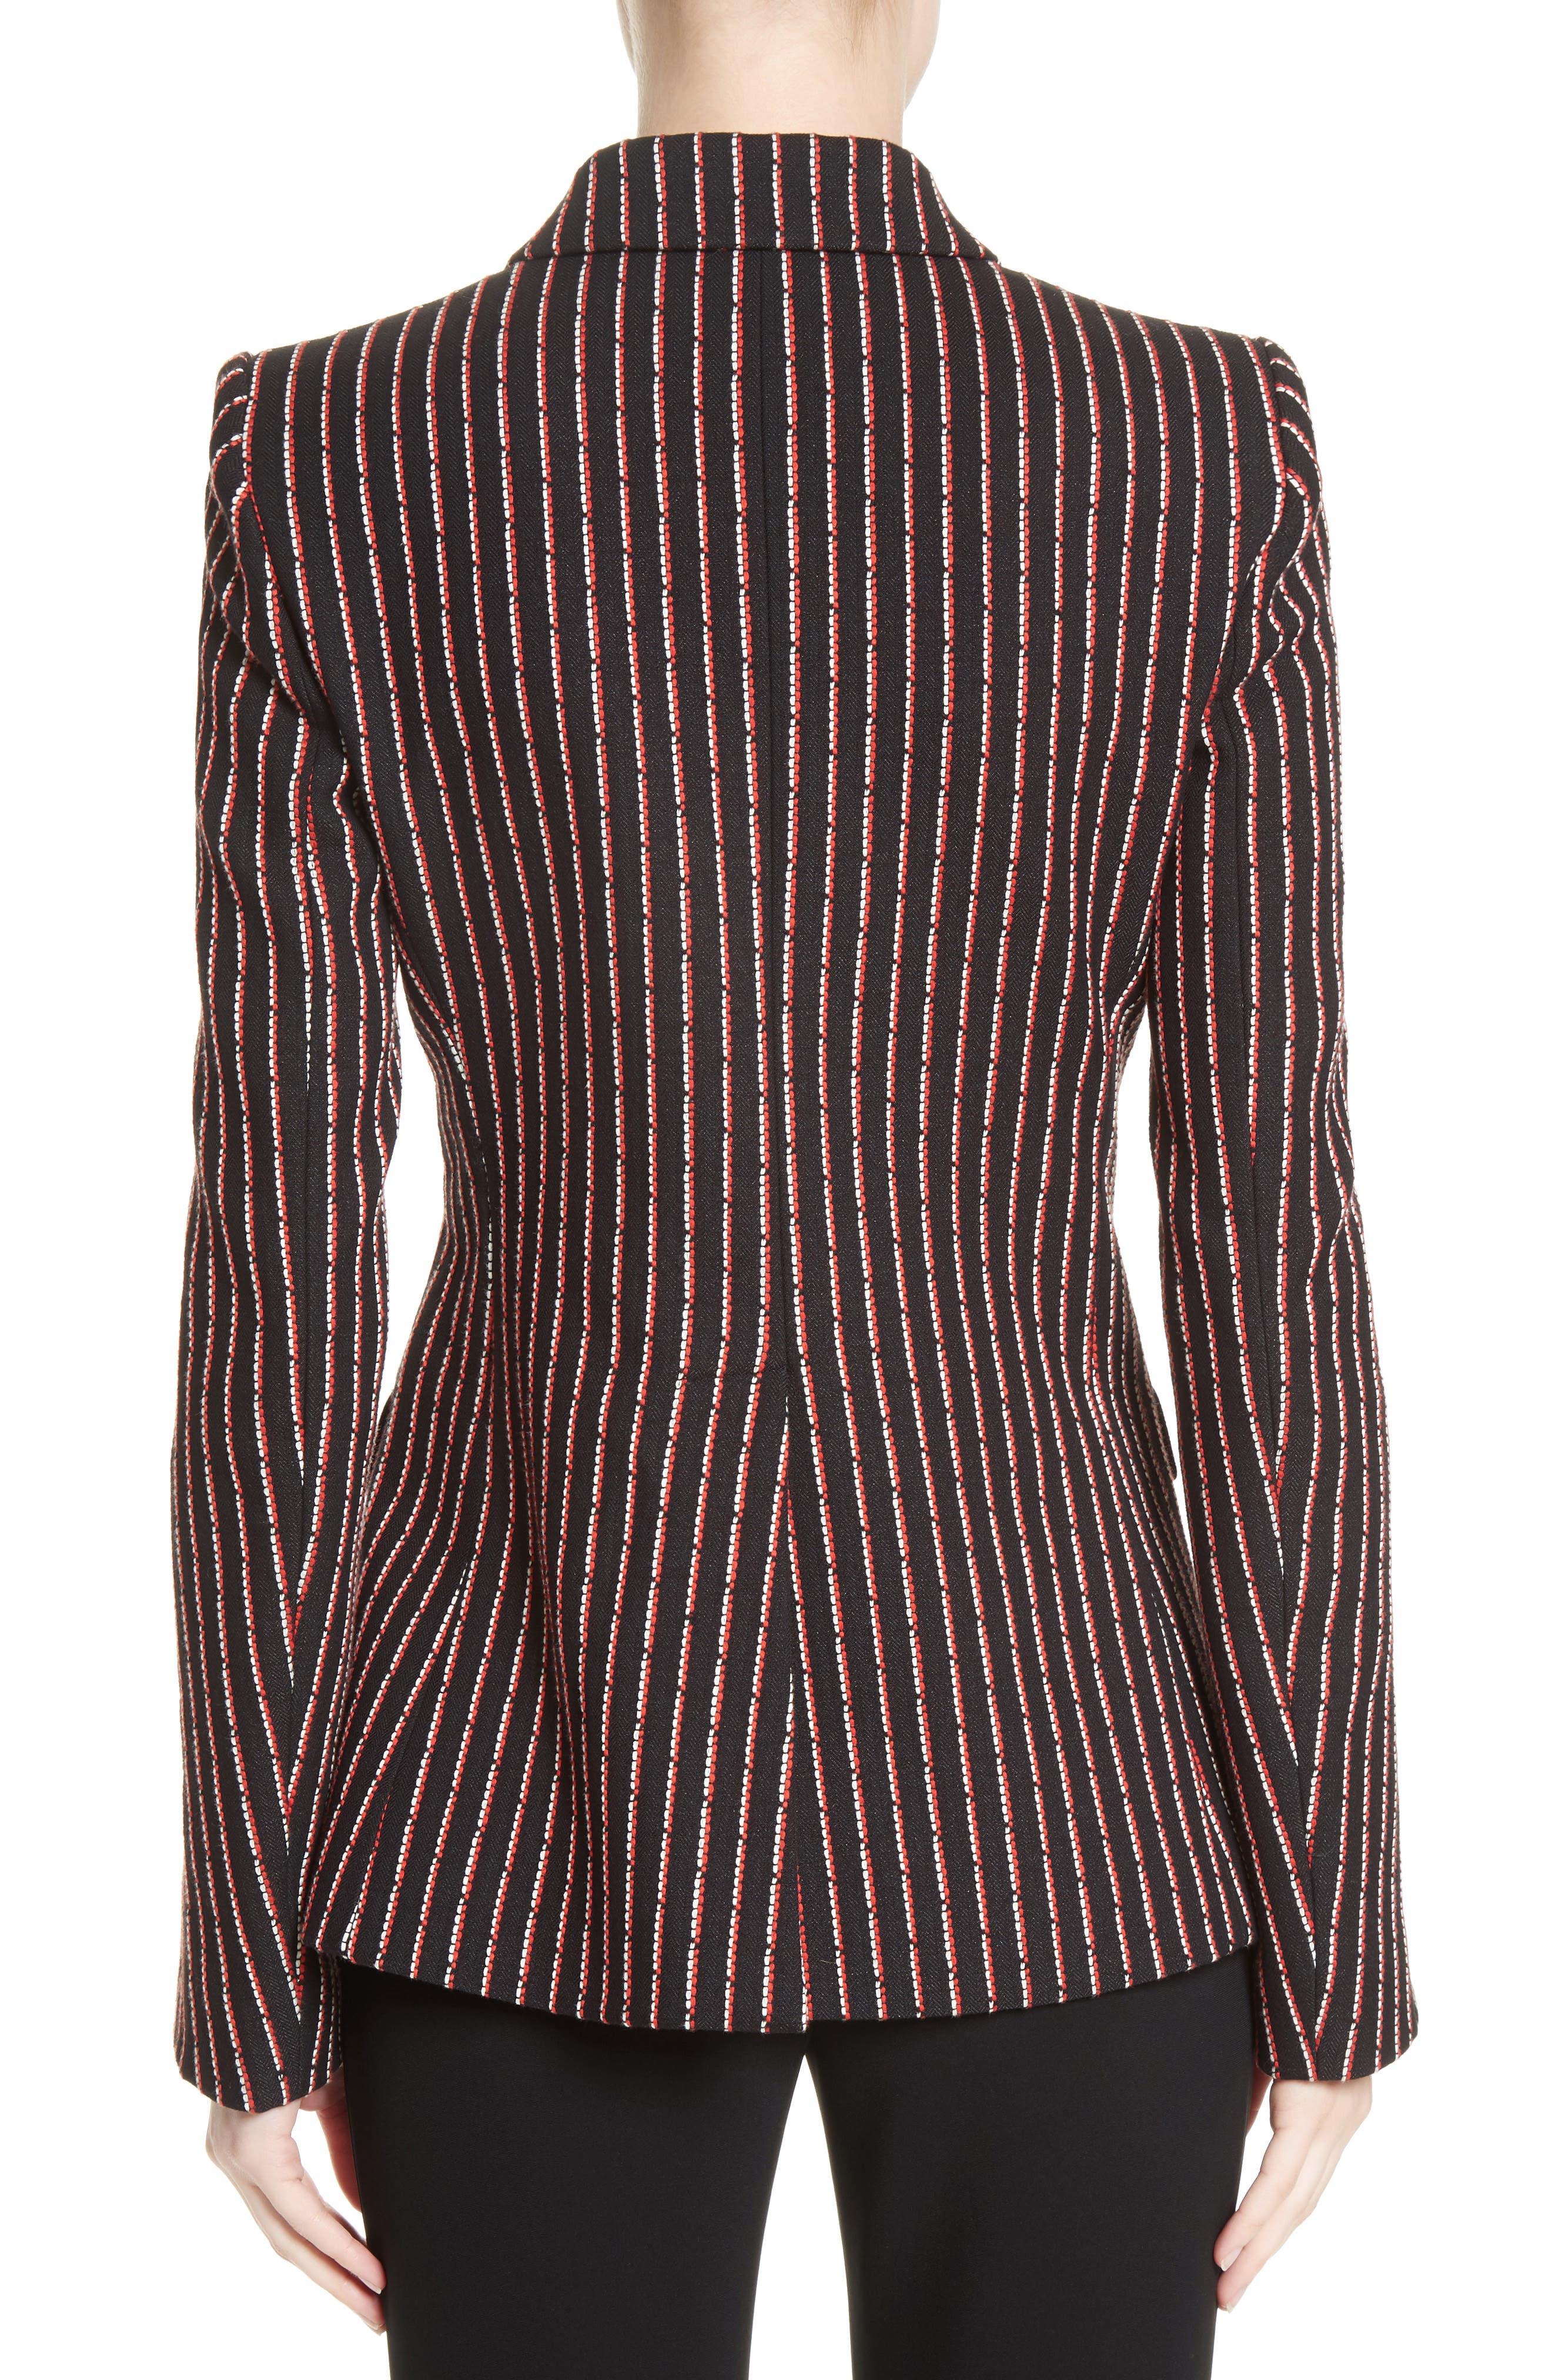 Pinstripe Double Breasted Blazer,                             Alternate thumbnail 2, color,                             Black White Persimmon